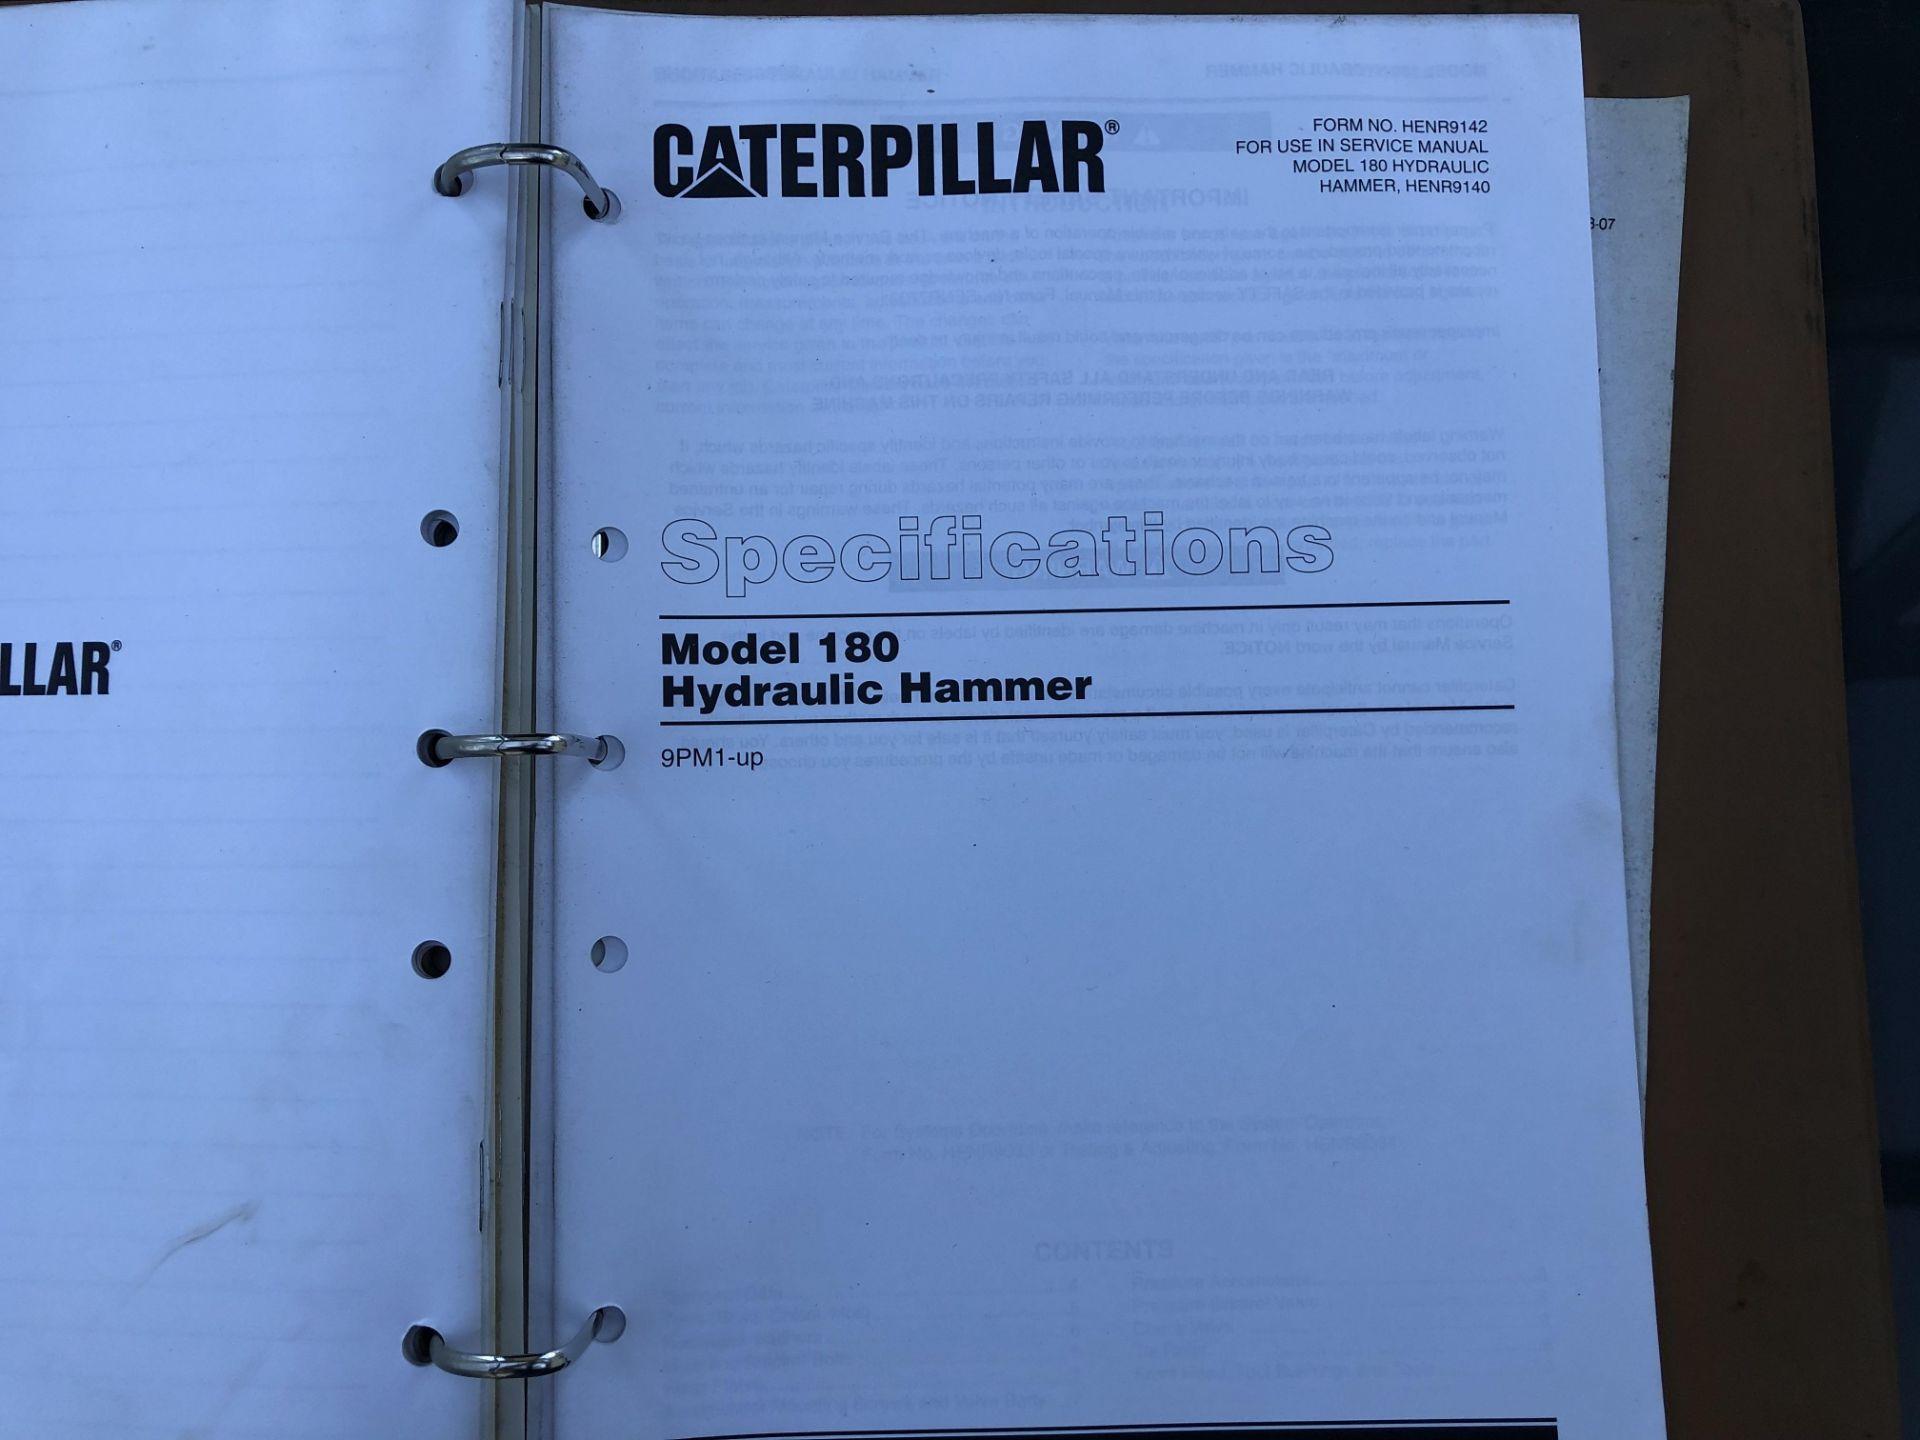 CATERPILLAR MODEL 180 HAMMER SERVICE MANUAL, GENUINE FACTORY CAT WORKSHOP MANUAL - Image 8 of 8